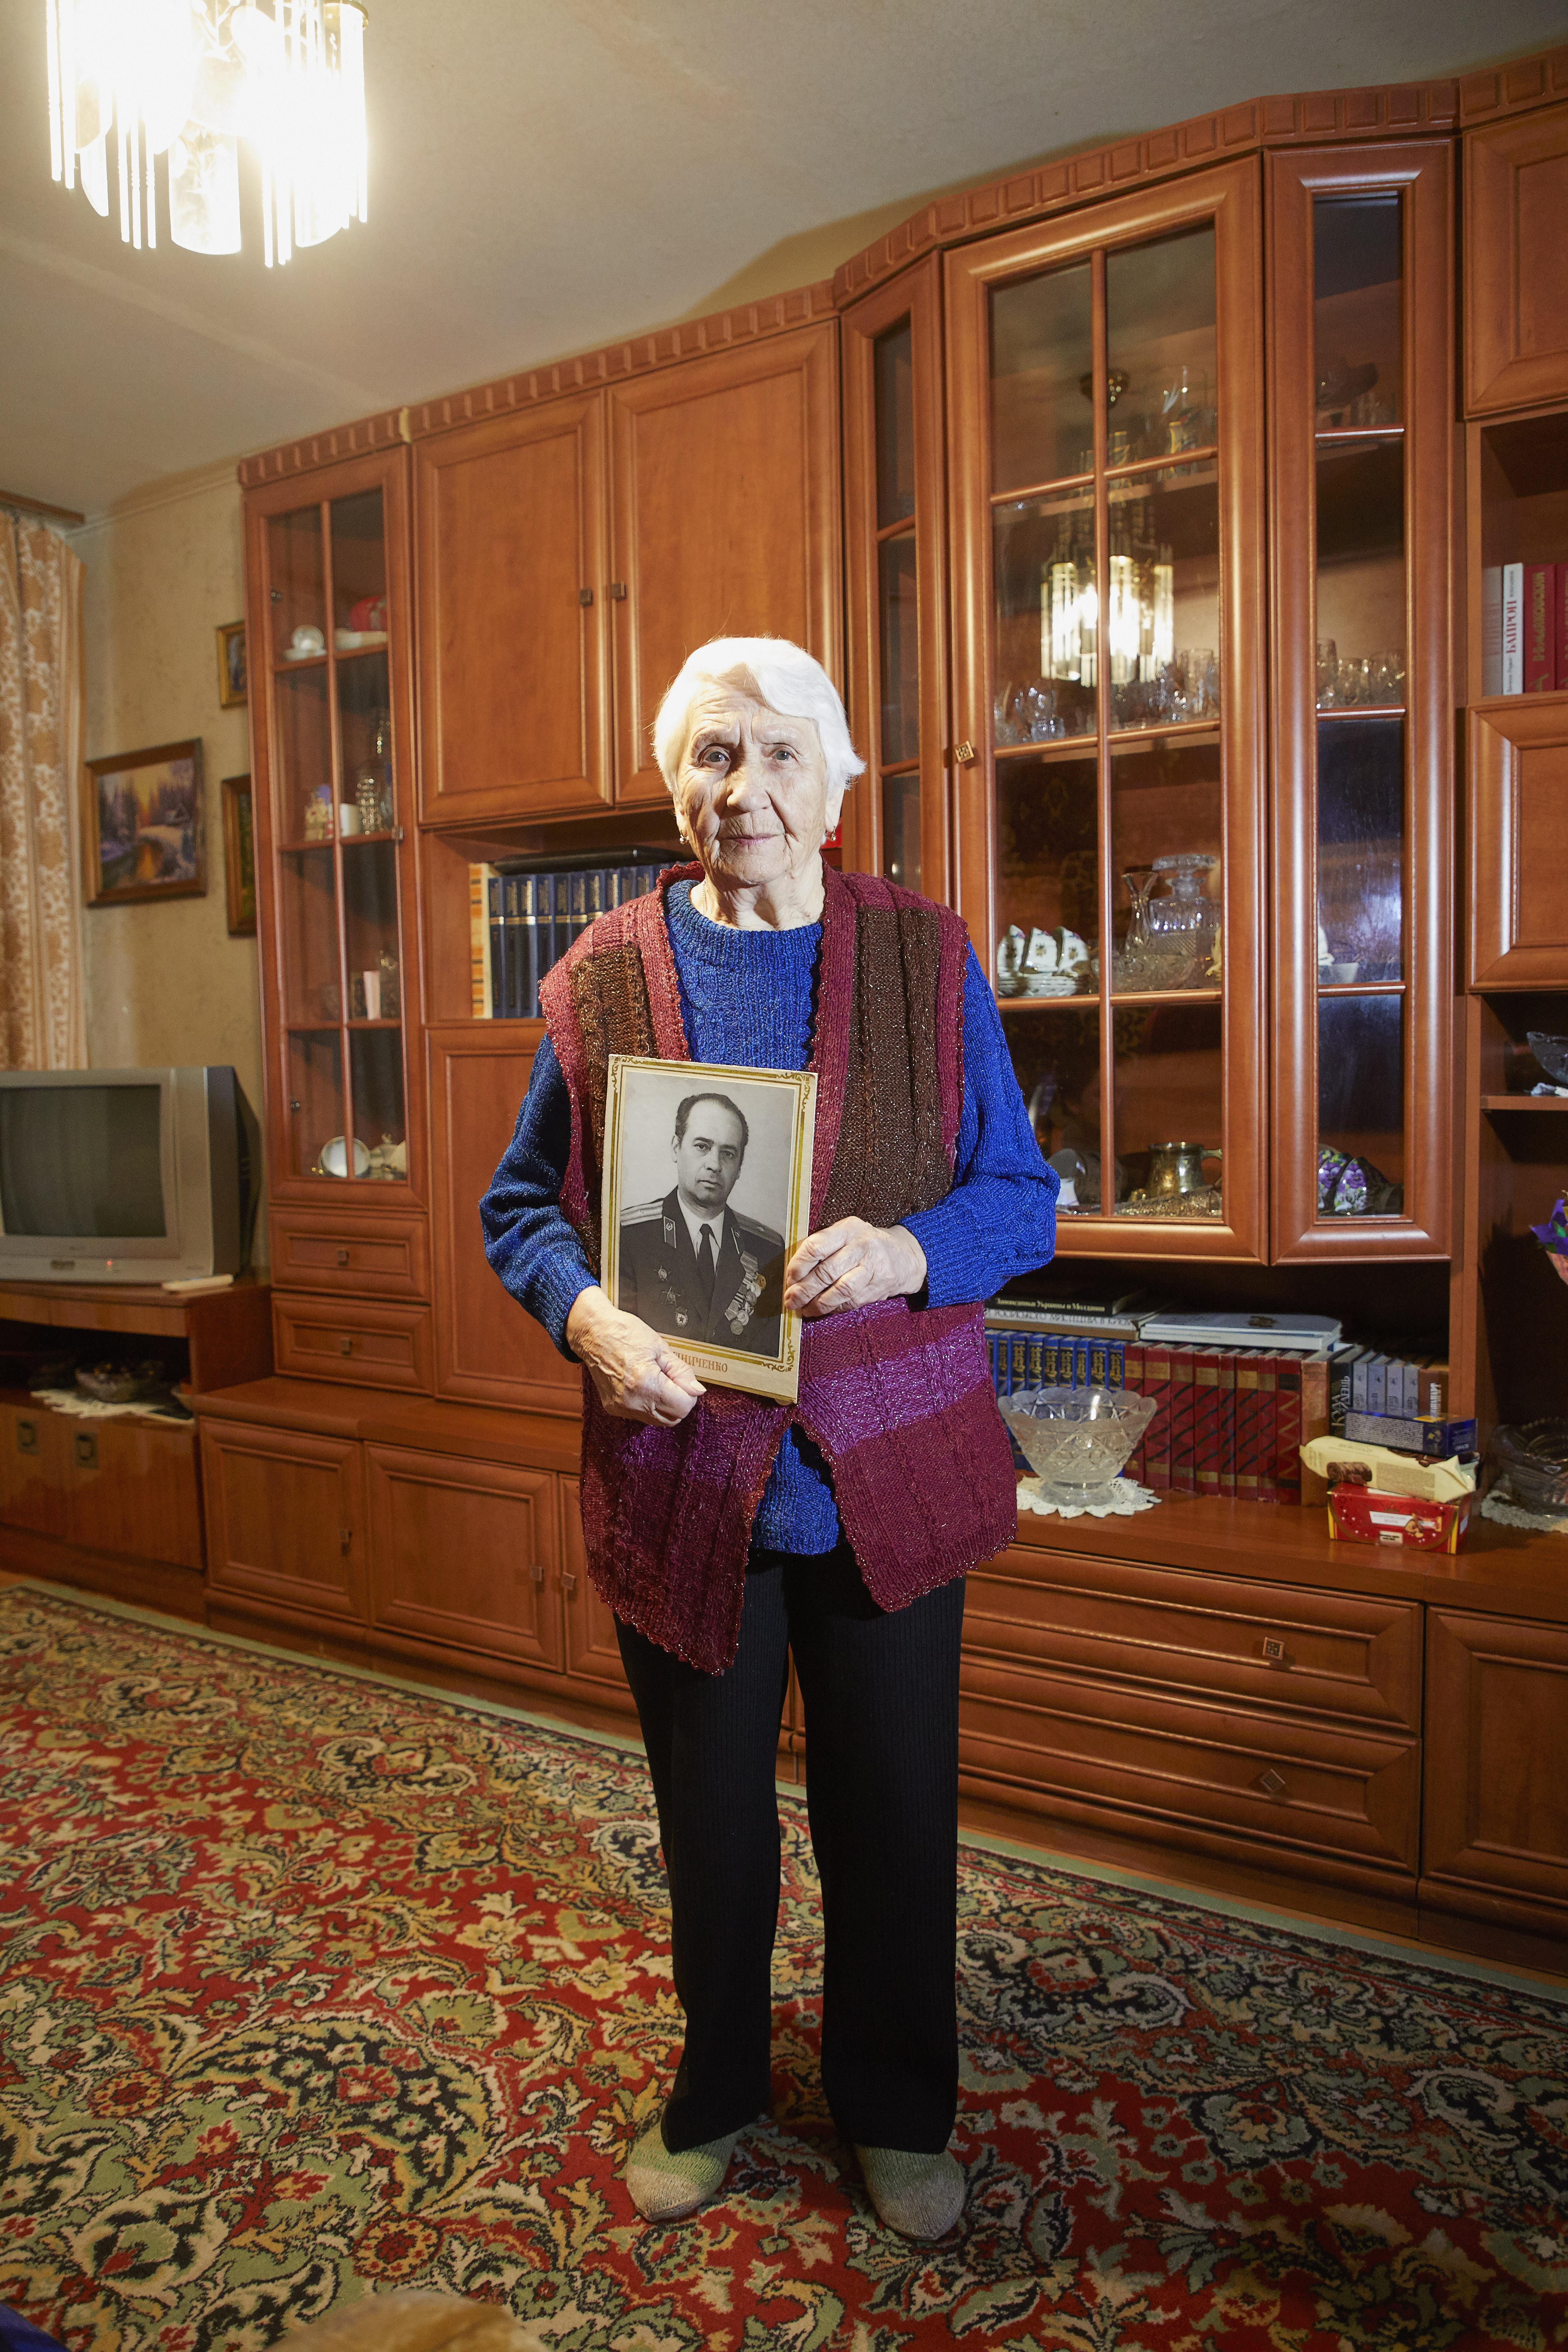 Ukraine Bila Tserkva Christenen voor Israel  30-01-2019  foto Jaco Klamer